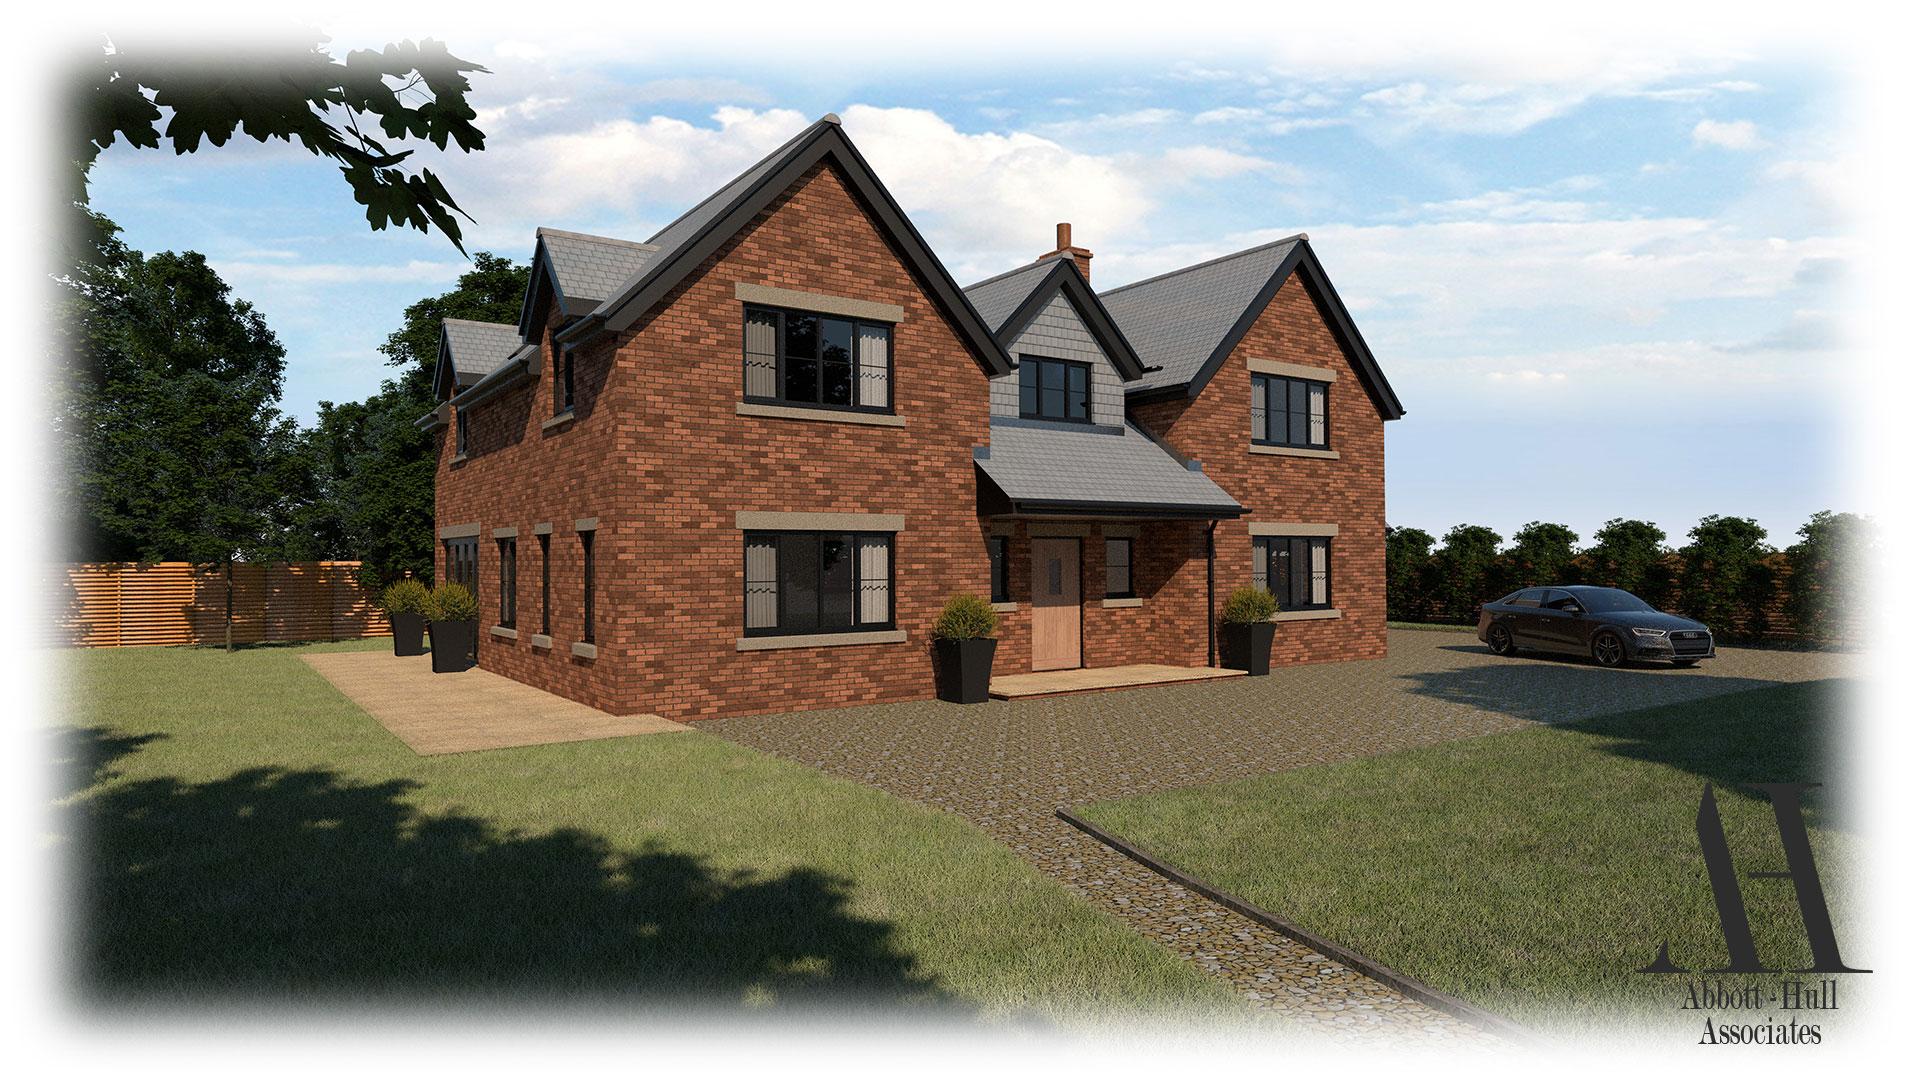 New Dwelling, Applegarth, Singleton - Visual B